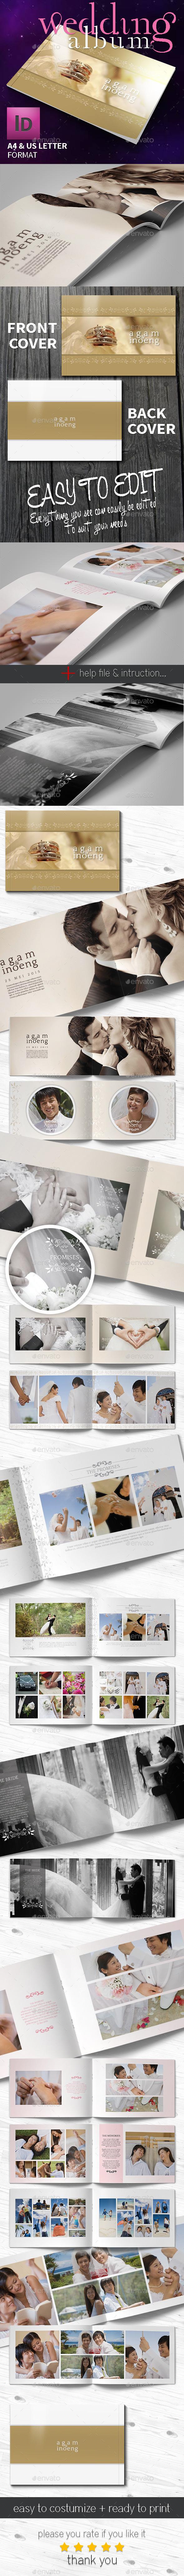 GraphicRiver Wedding Photo Album 11221785